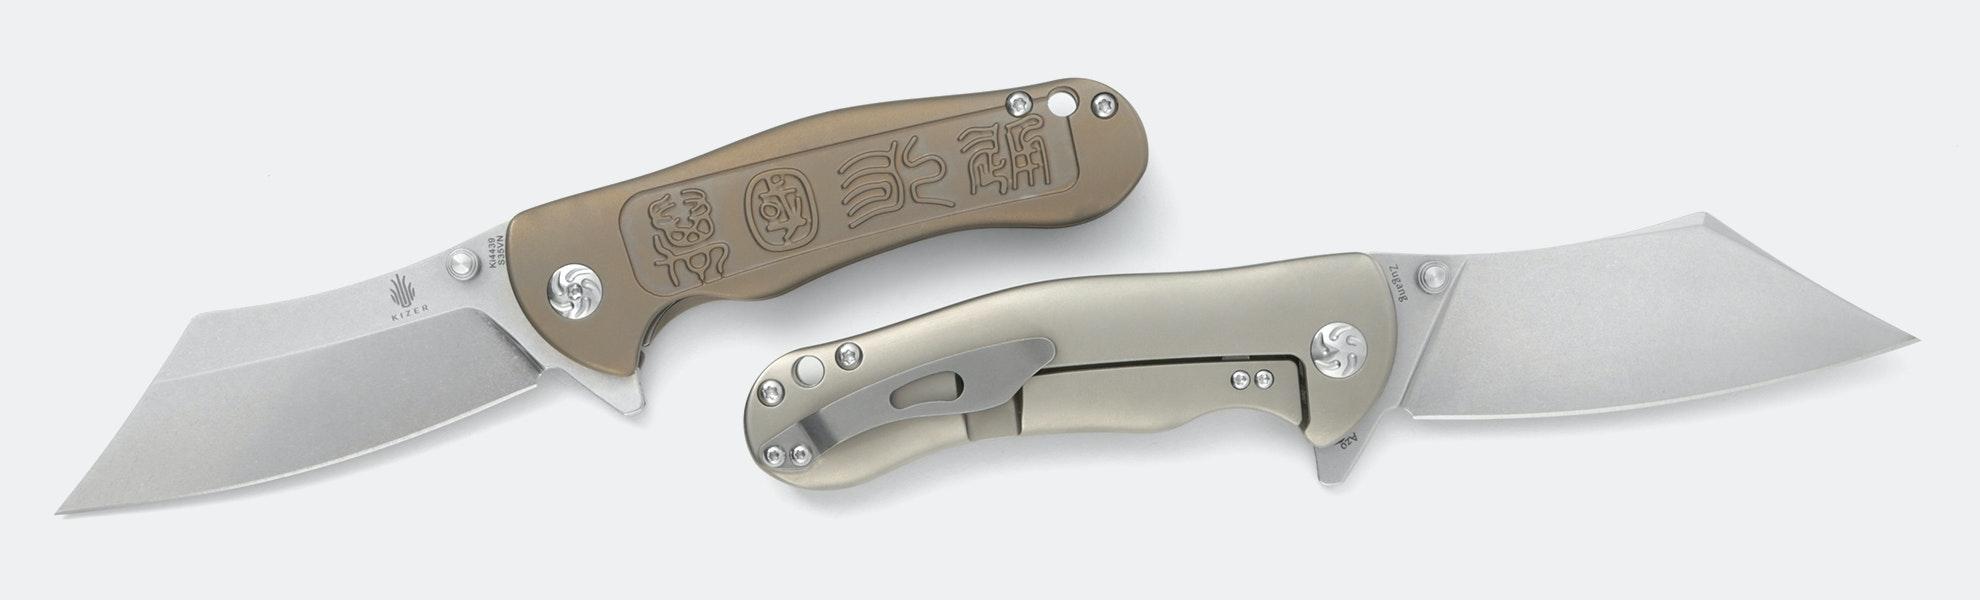 Kizer Zugang S35VN Frame Lock Knife